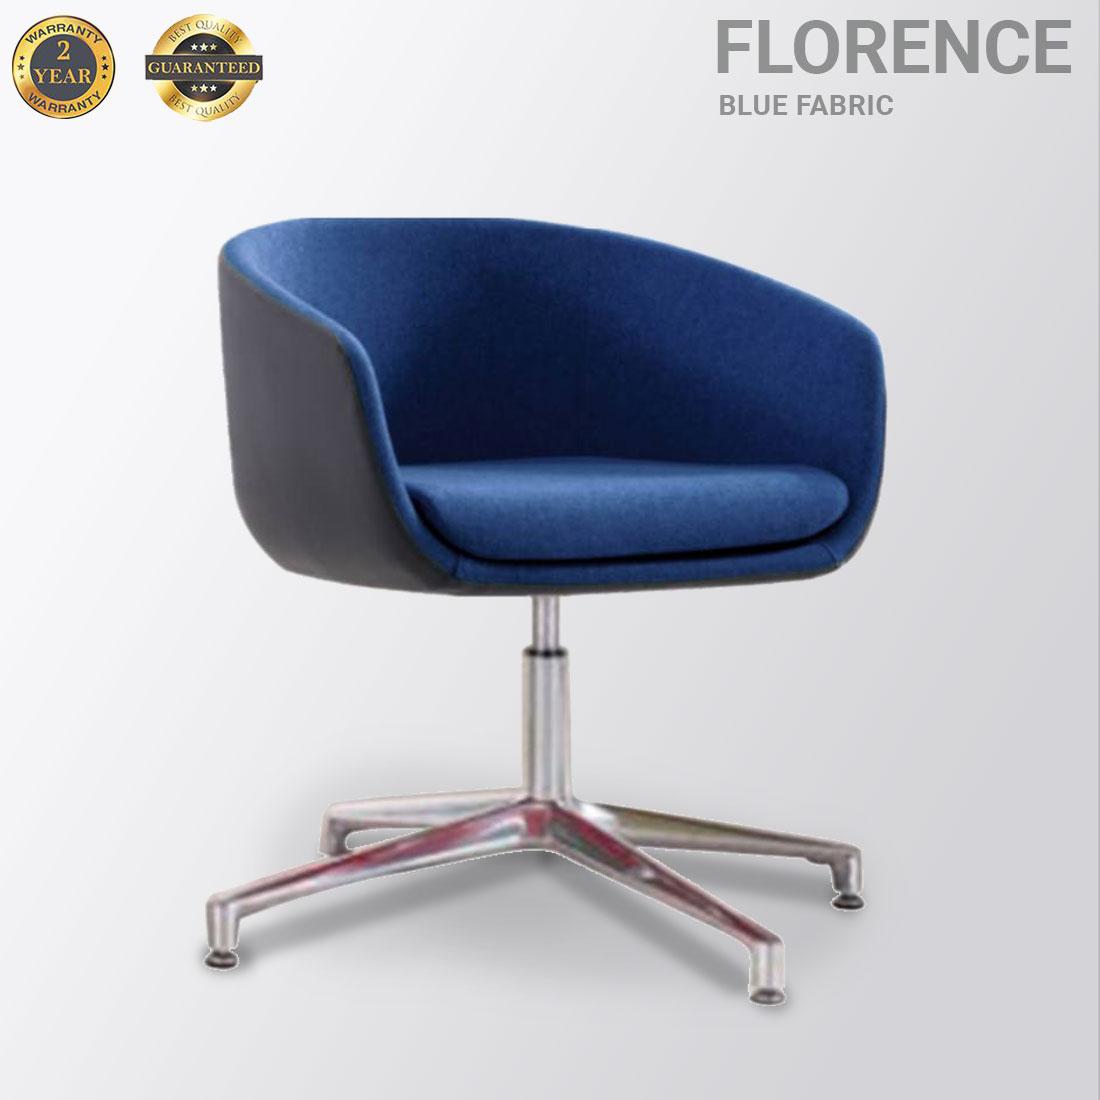 FLORENCE FABRIC  BLUE